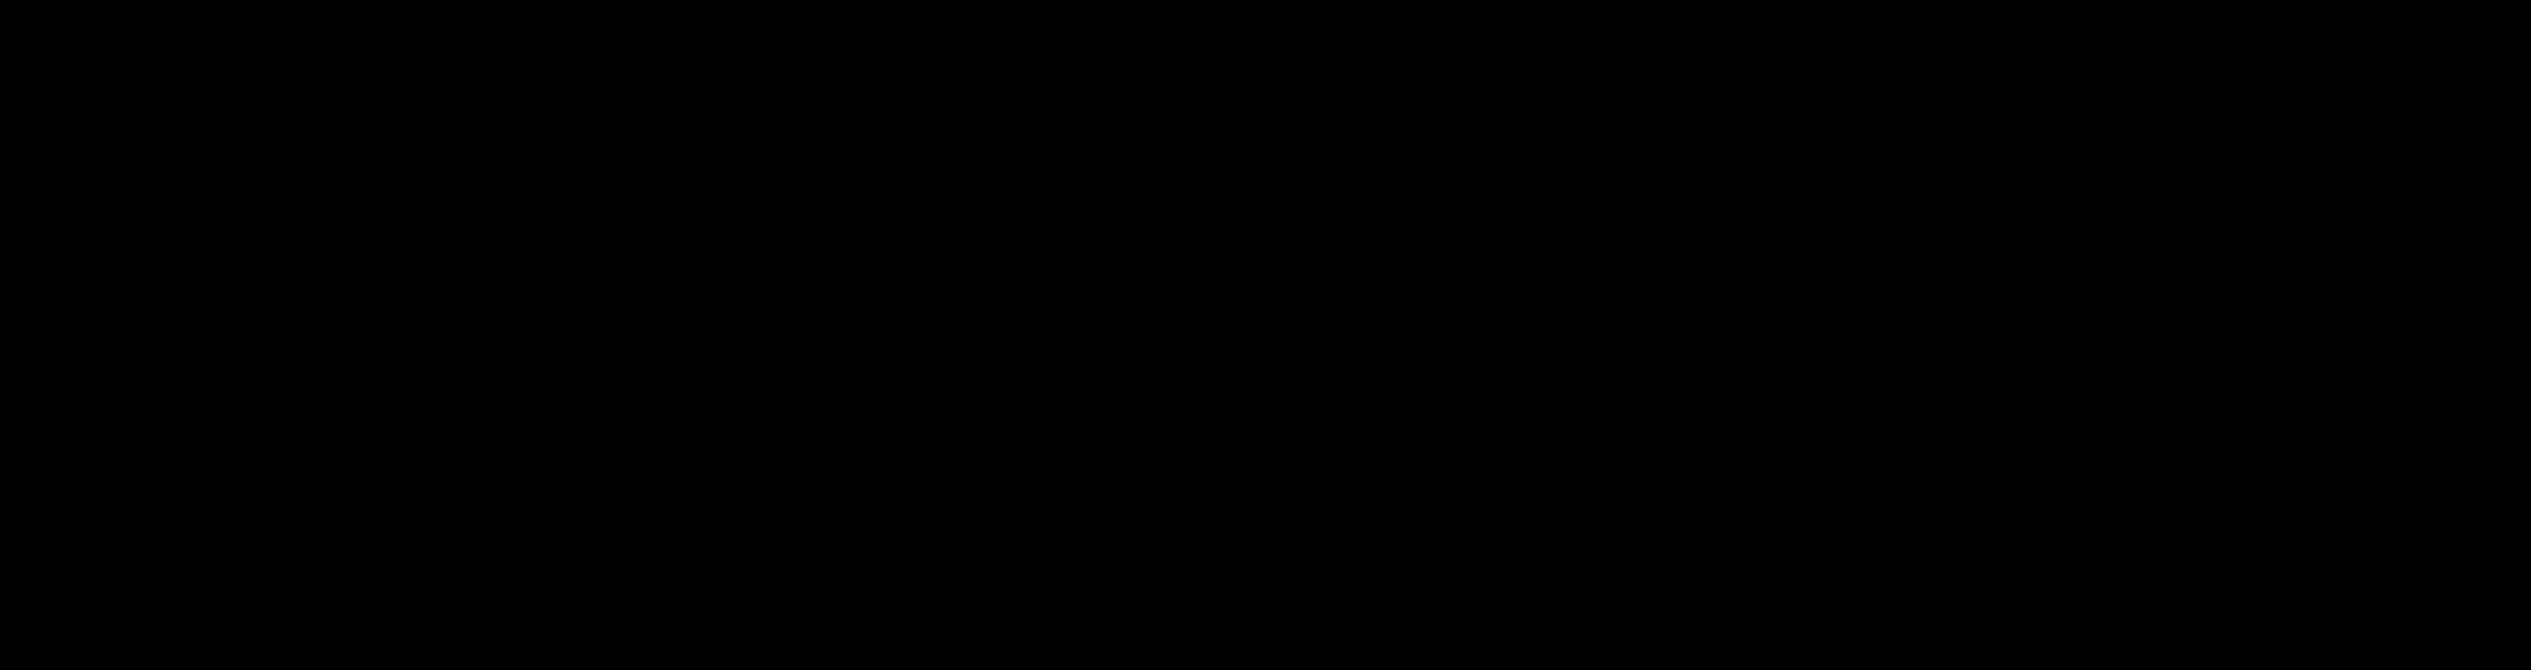 Bisphenol A-(diphenyl-<sup>13</sup>C<sub>12</sub>) bis-(β-D-glucuronide)